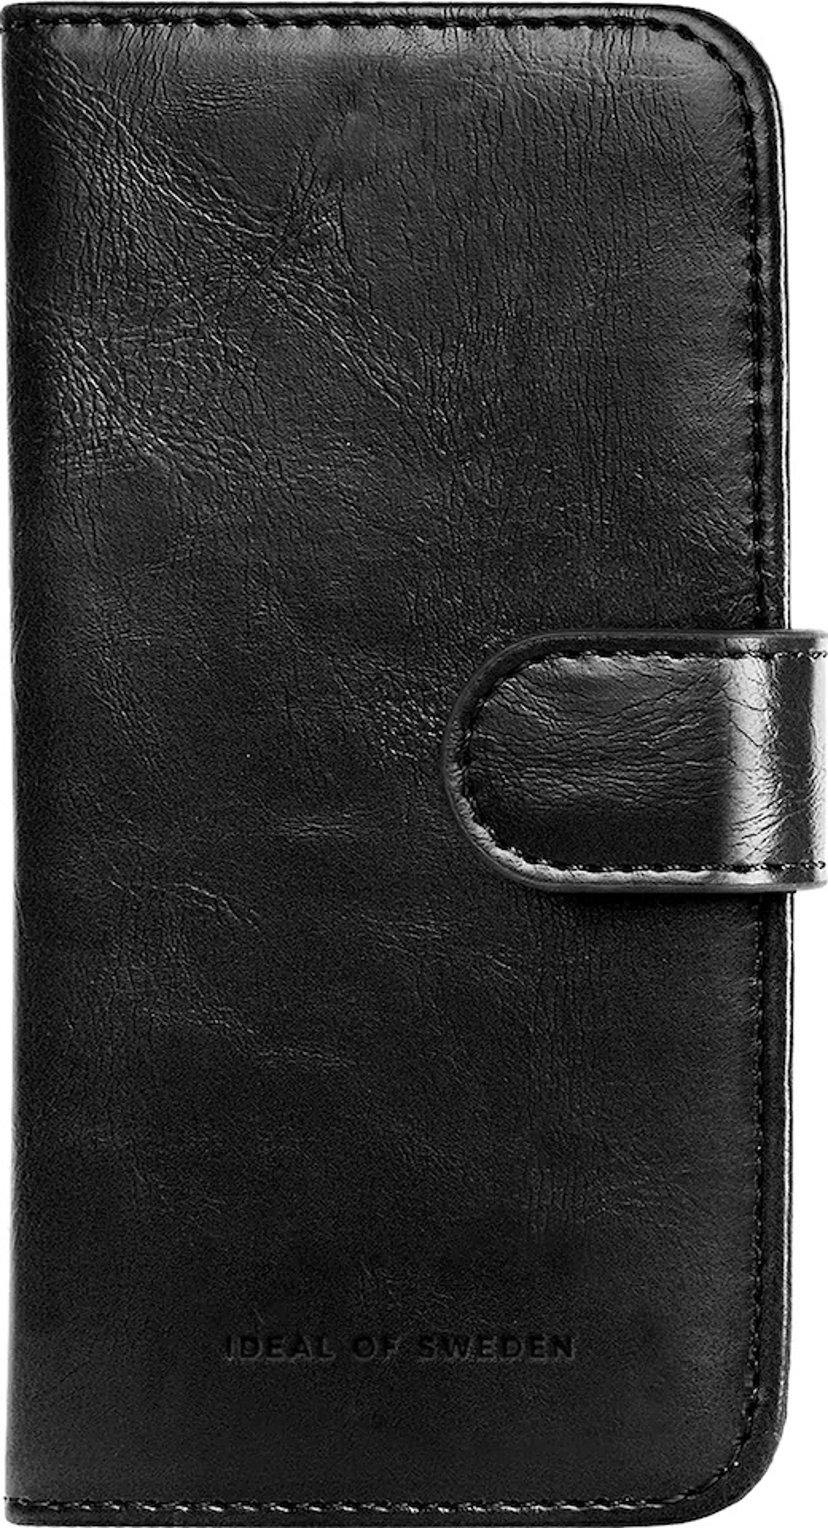 iDeal of Sweden IDEAL Magnet Wallet+ iPhone 12 Pro Max Sort